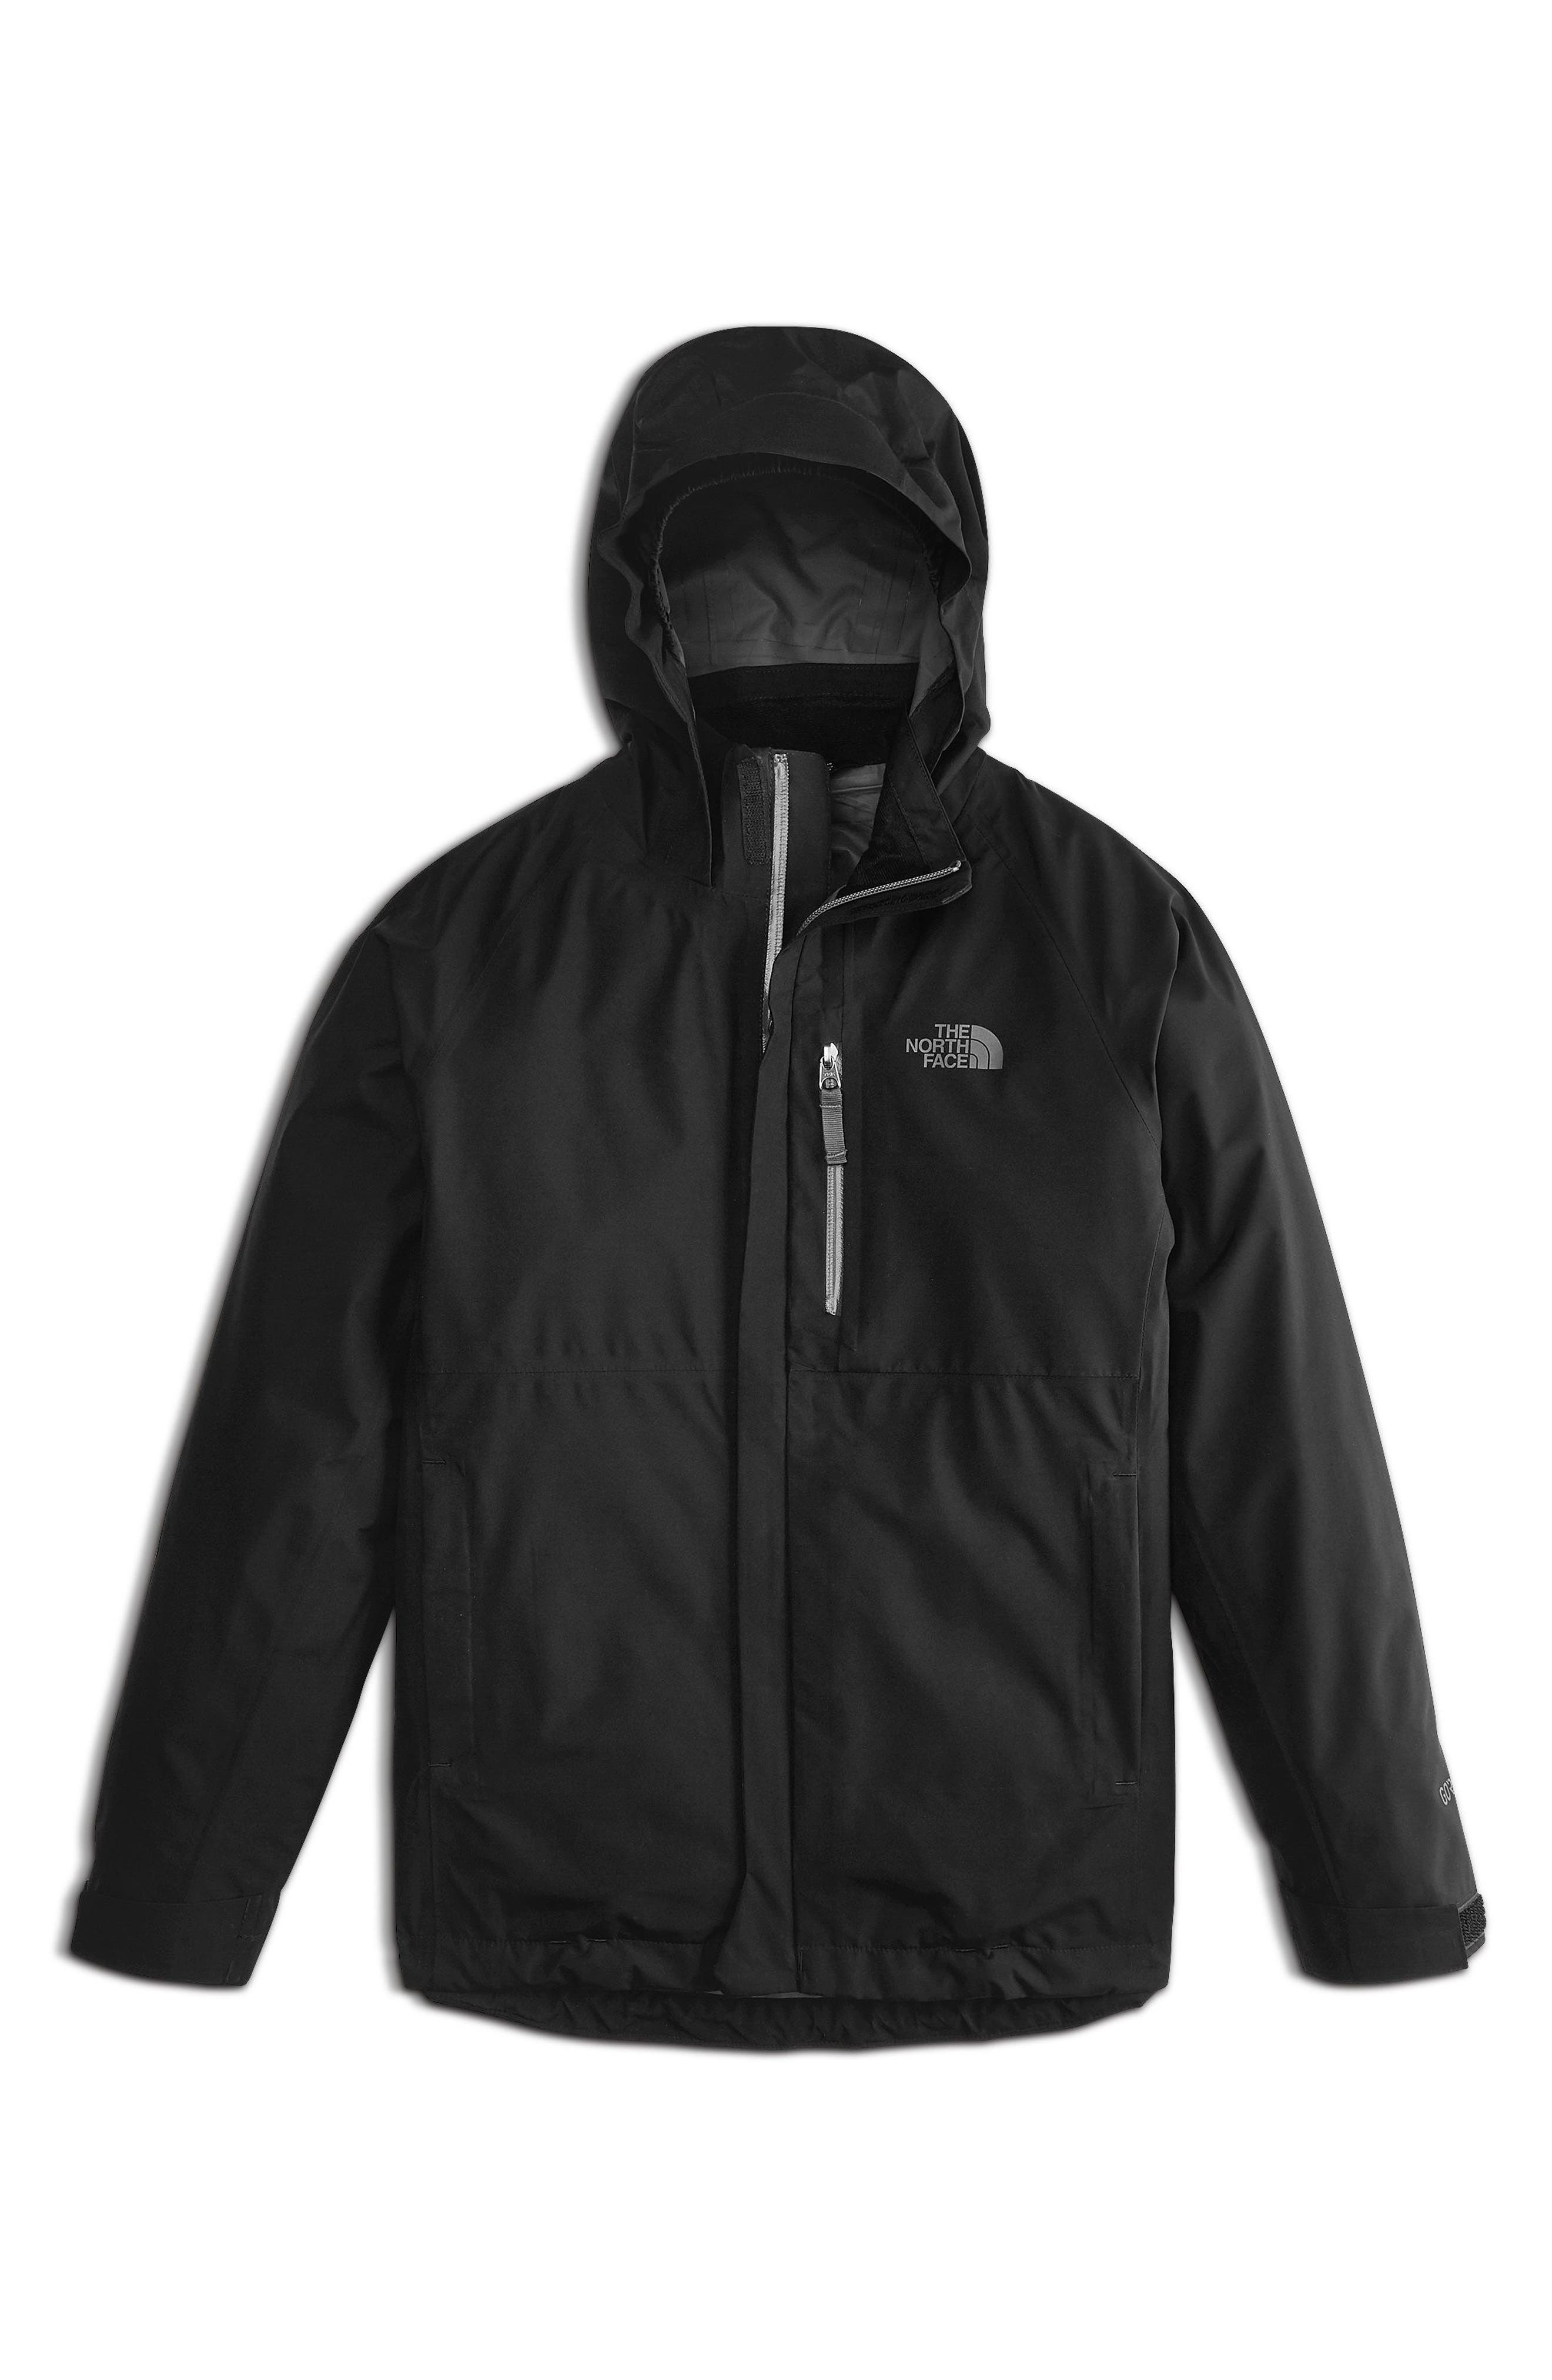 Dryzzle Gore-Tex<sup>®</sup> Waterproof Jacket,                         Main,                         color, Tnf Black